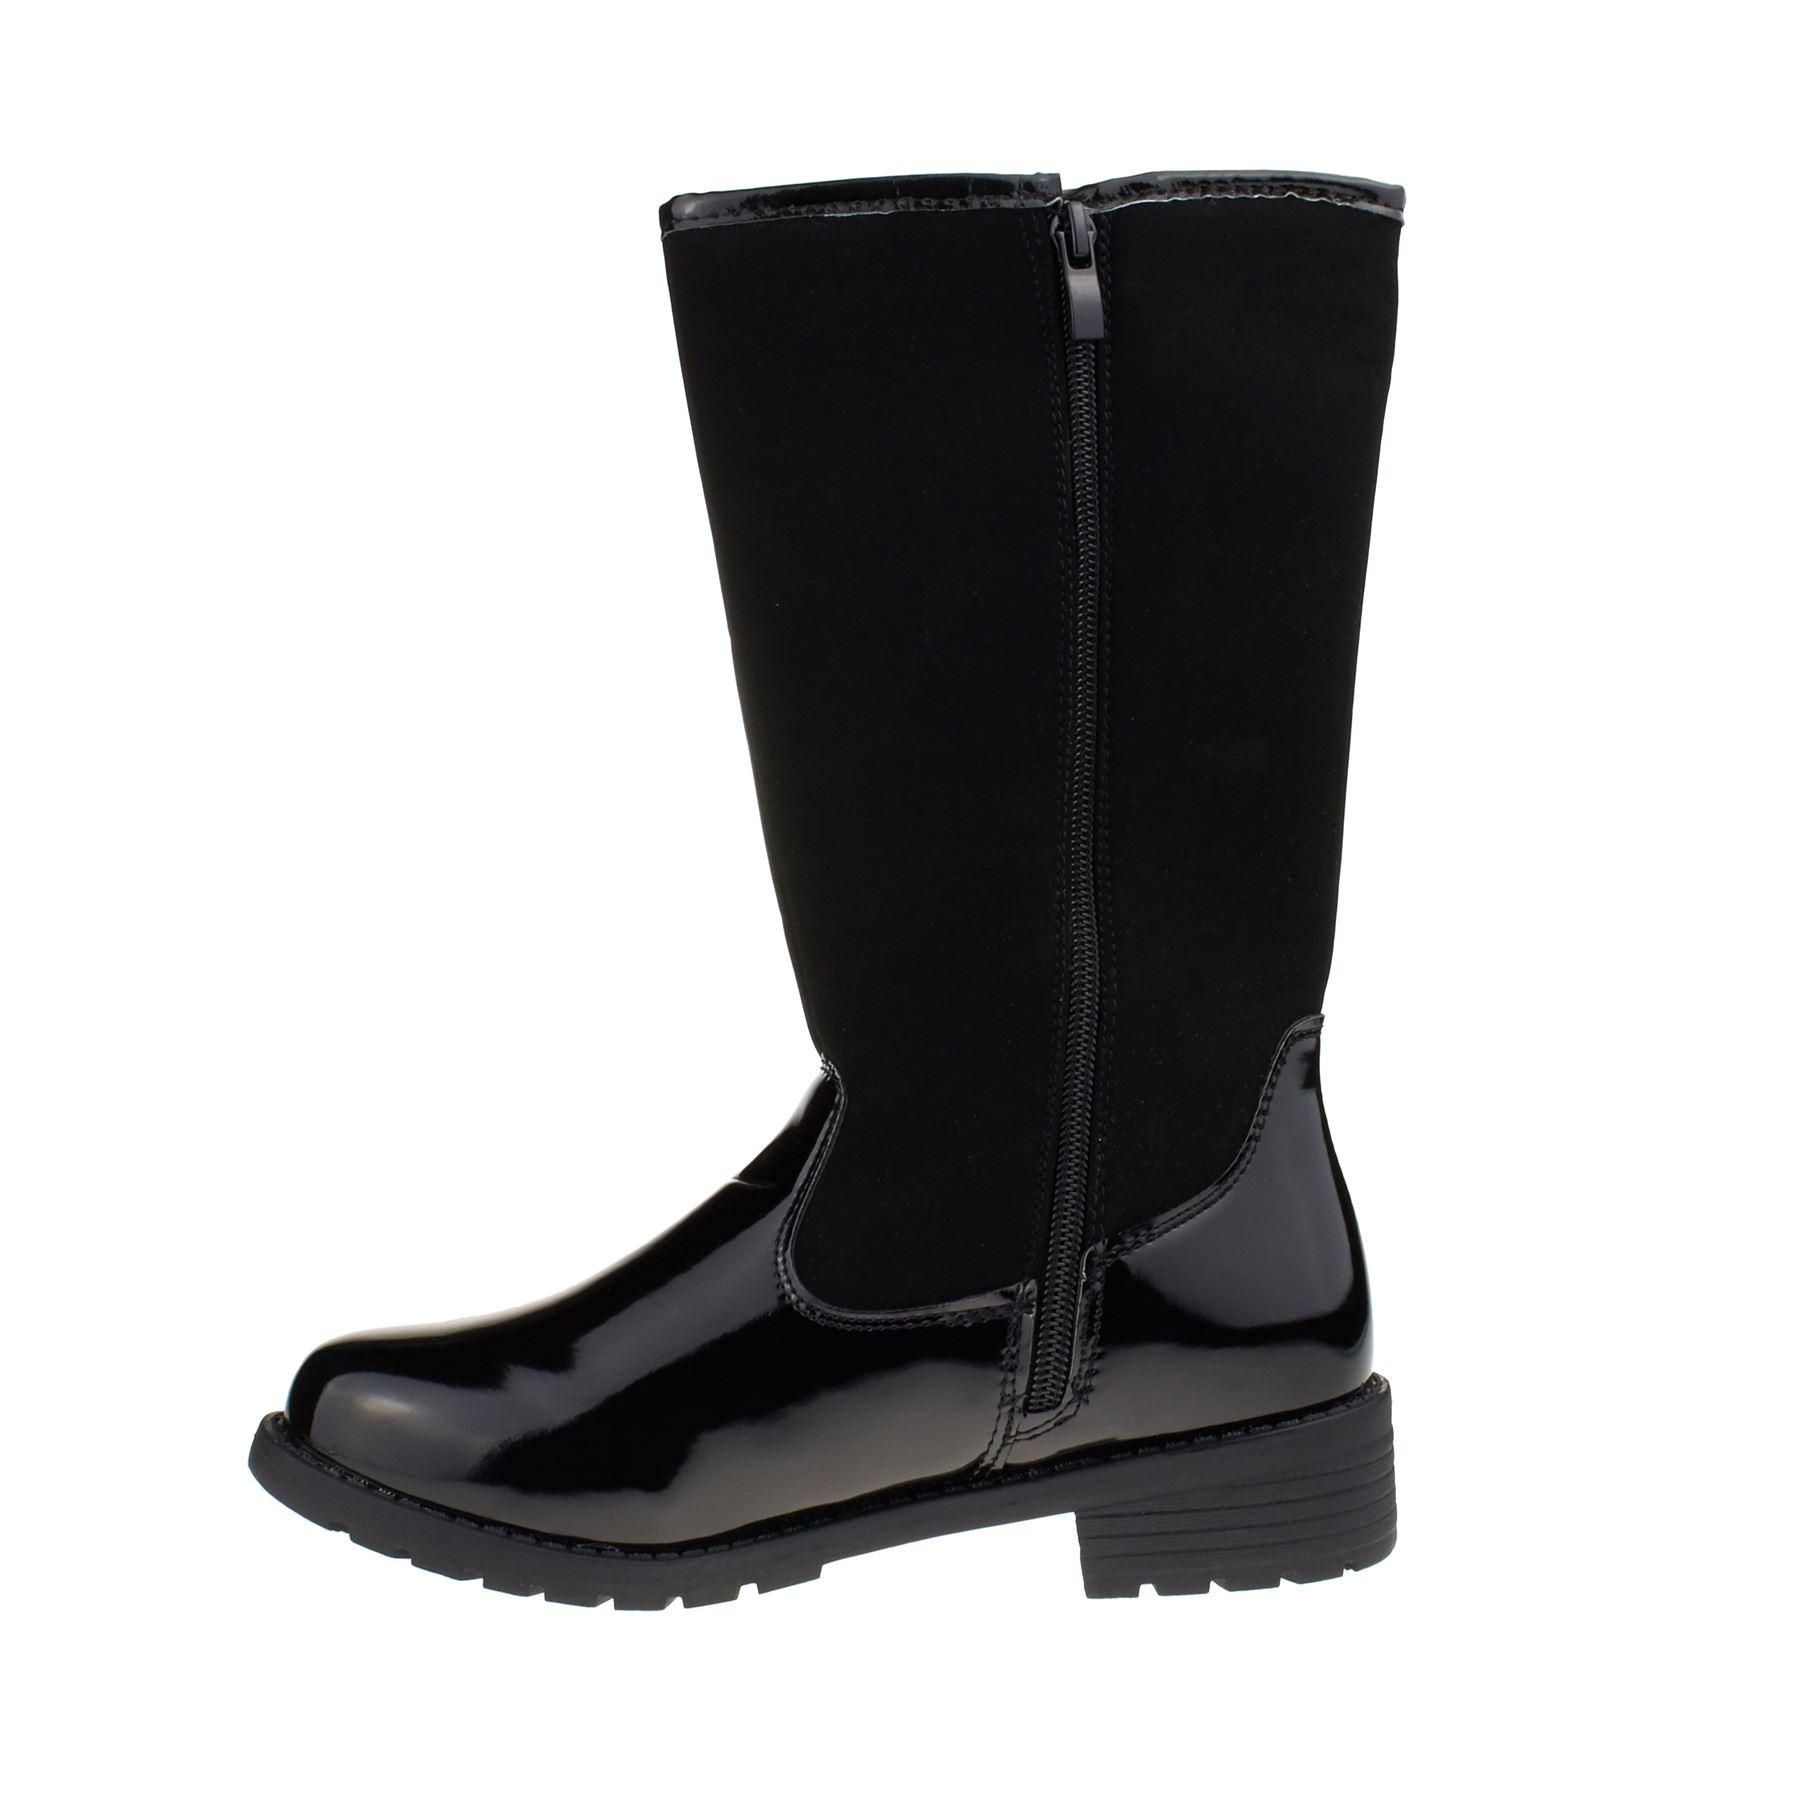 New Infants Girls Kids Warm Mid Calf Boots Casual Fur Snow Winter Zip Up Grip UK